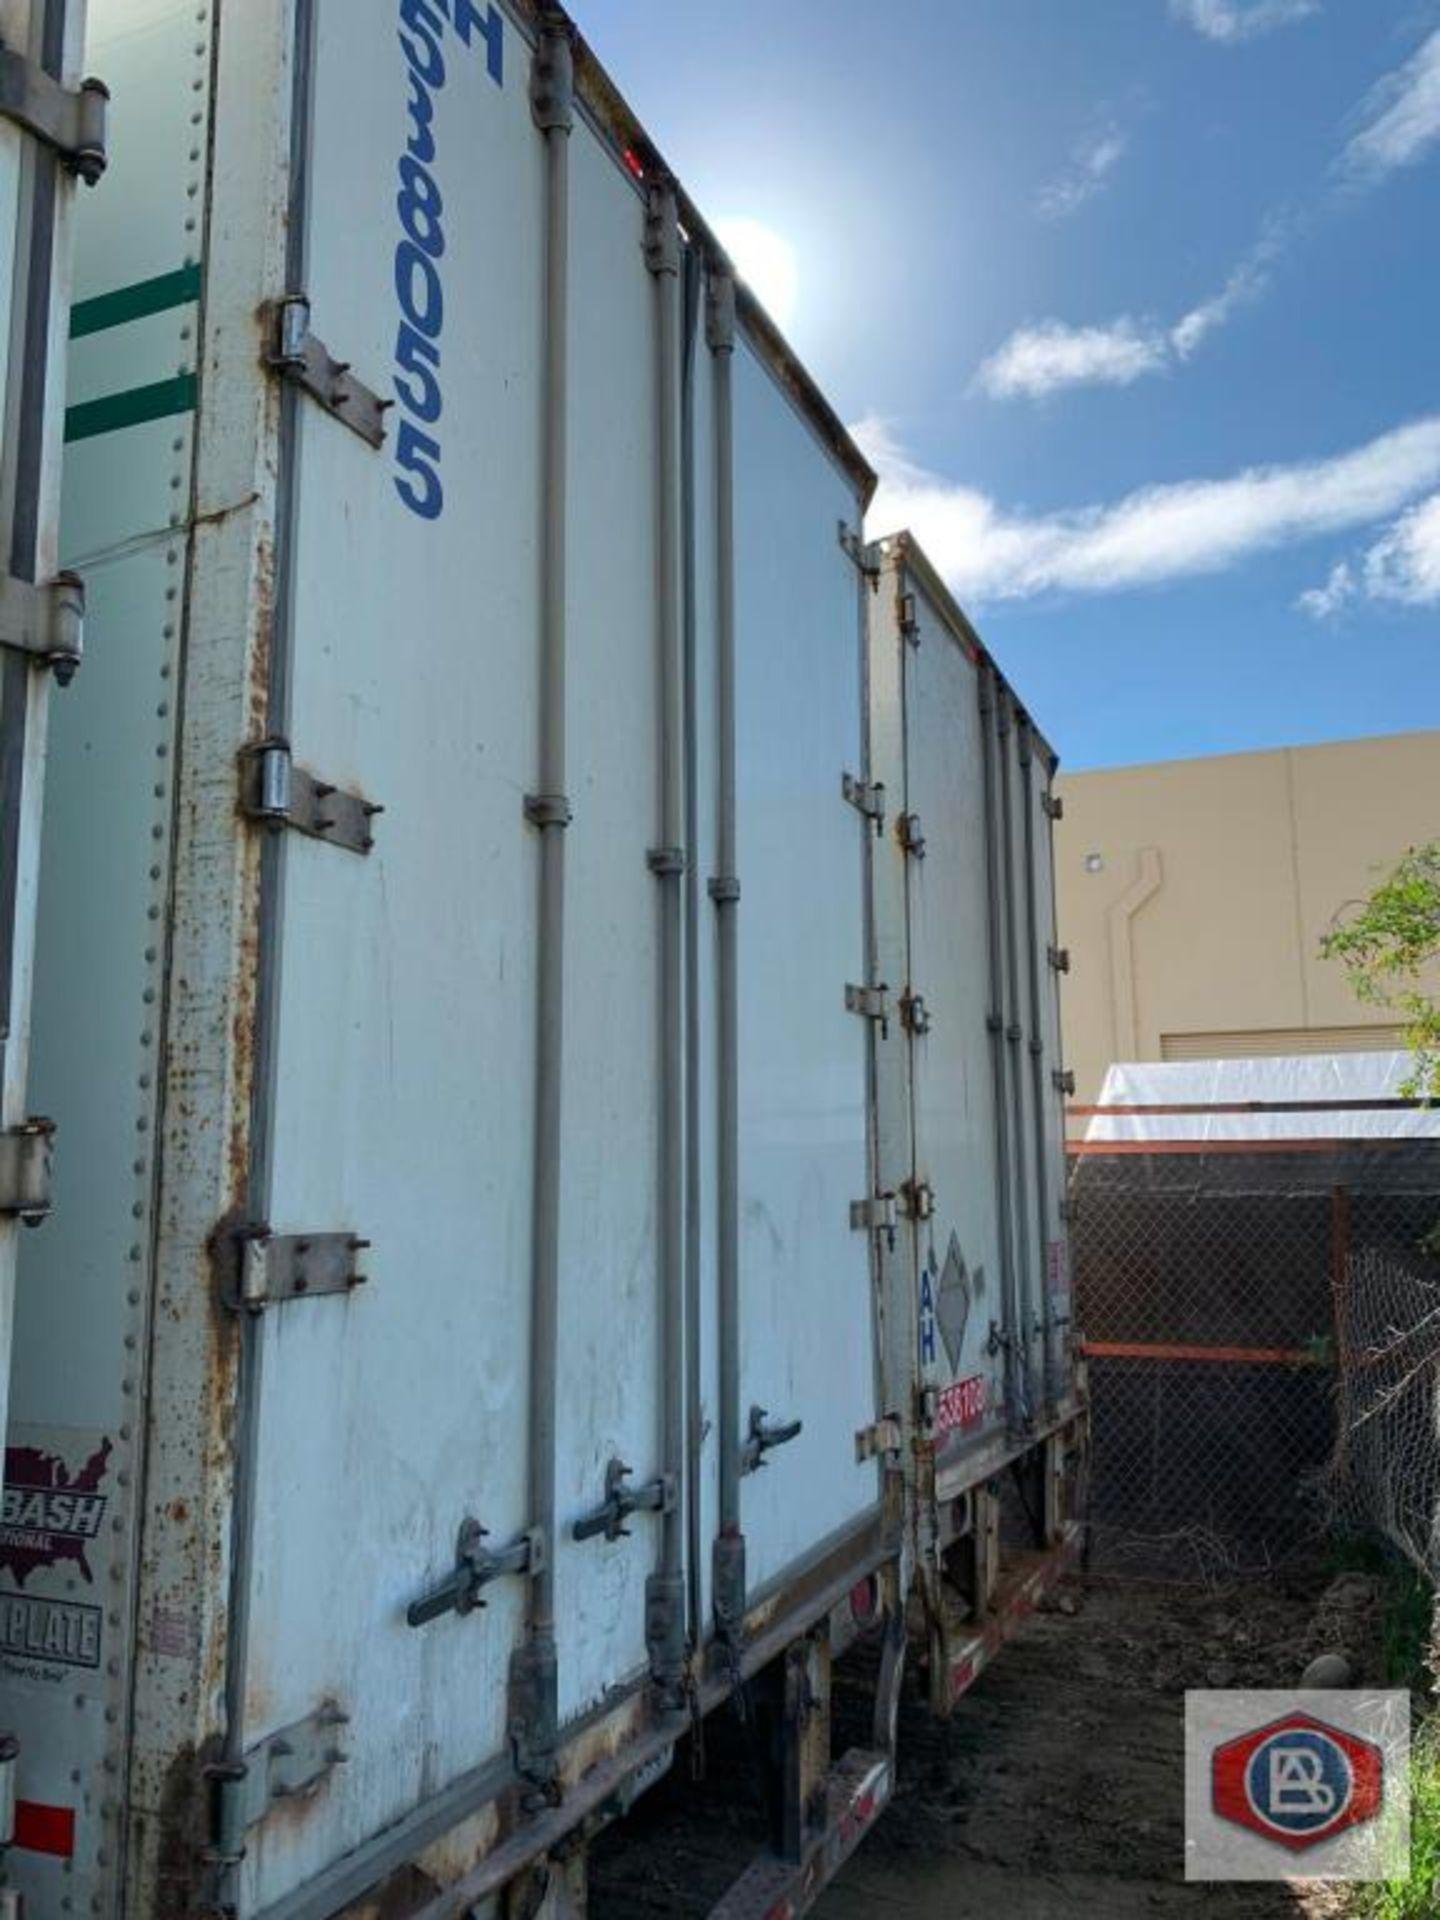 2002 Wabash DuraPlate Logistics Van Trailer 53 ft. - Image 3 of 5